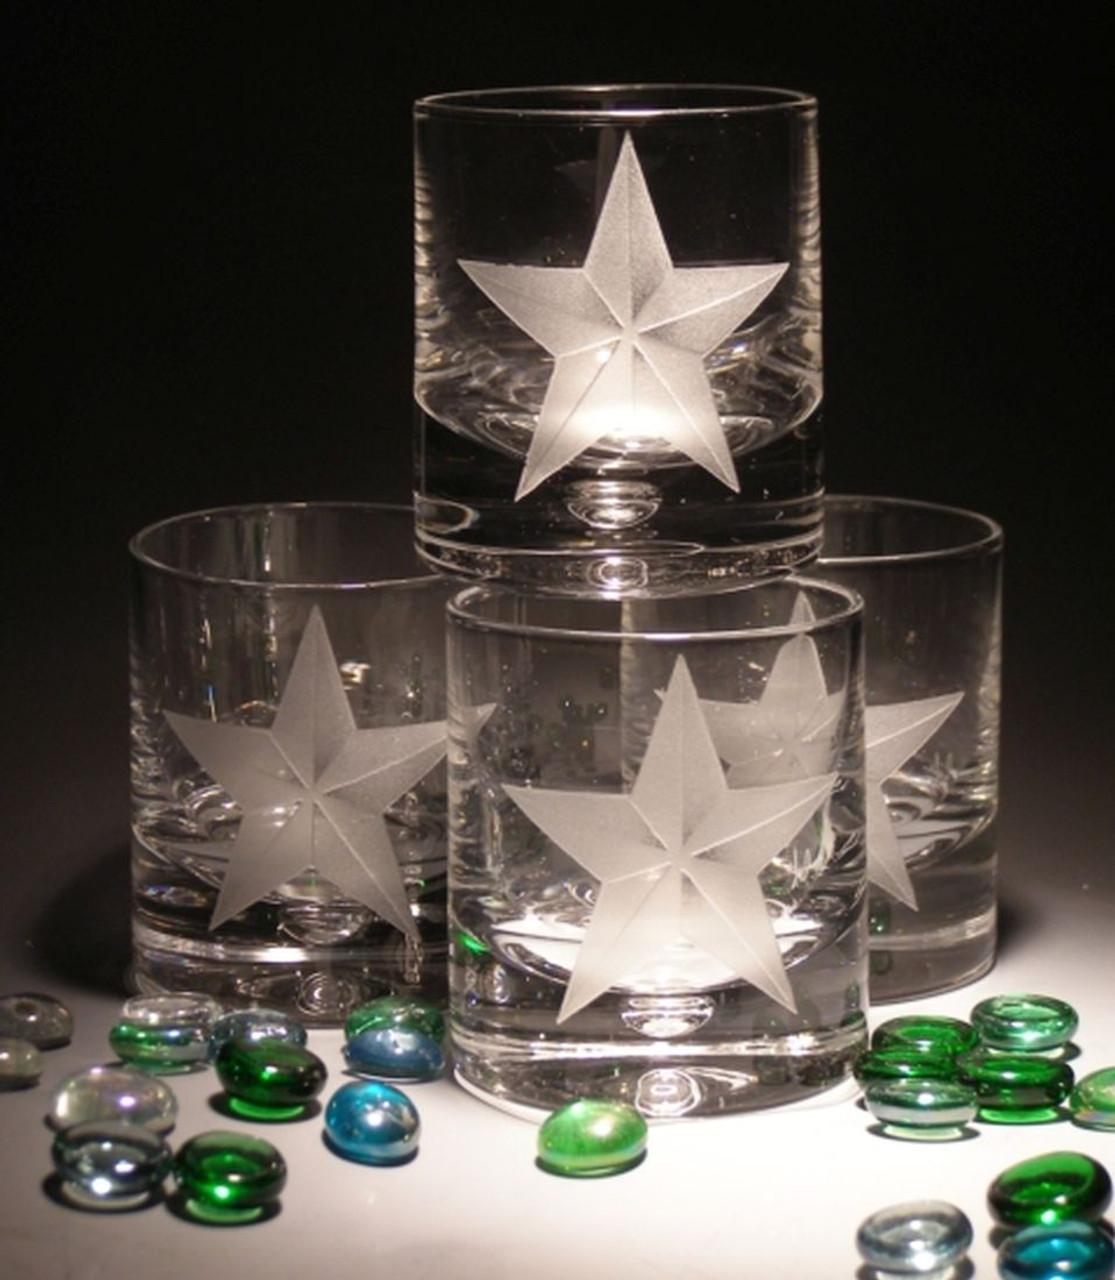 Hand Carved Crystal Single Malt Rocks Glasses - 8oz - Set of 2 - Personalized